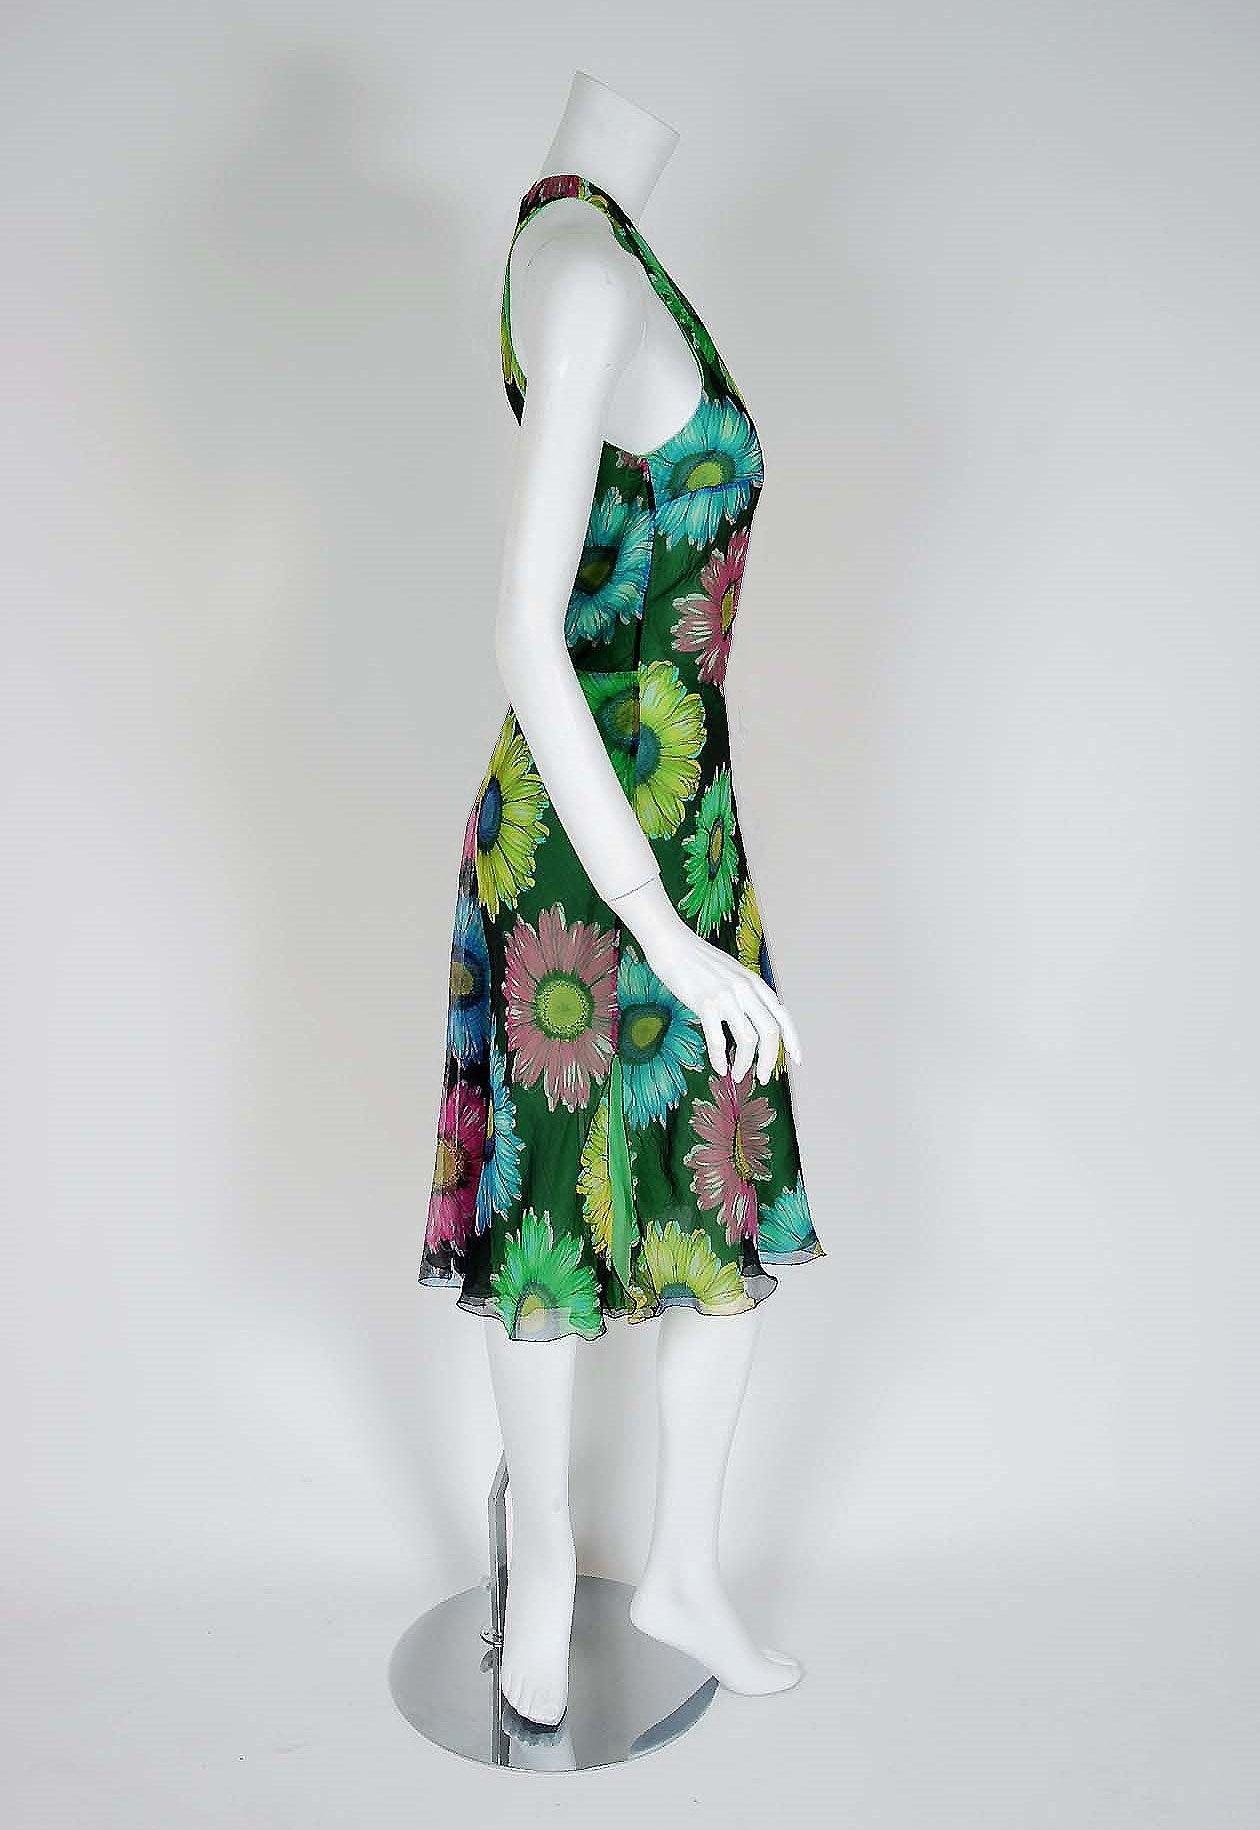 Blue 1990's Gianni Versace Couture Sunflower Floral Chiffon Bias-Cut Fishtail Dress For Sale